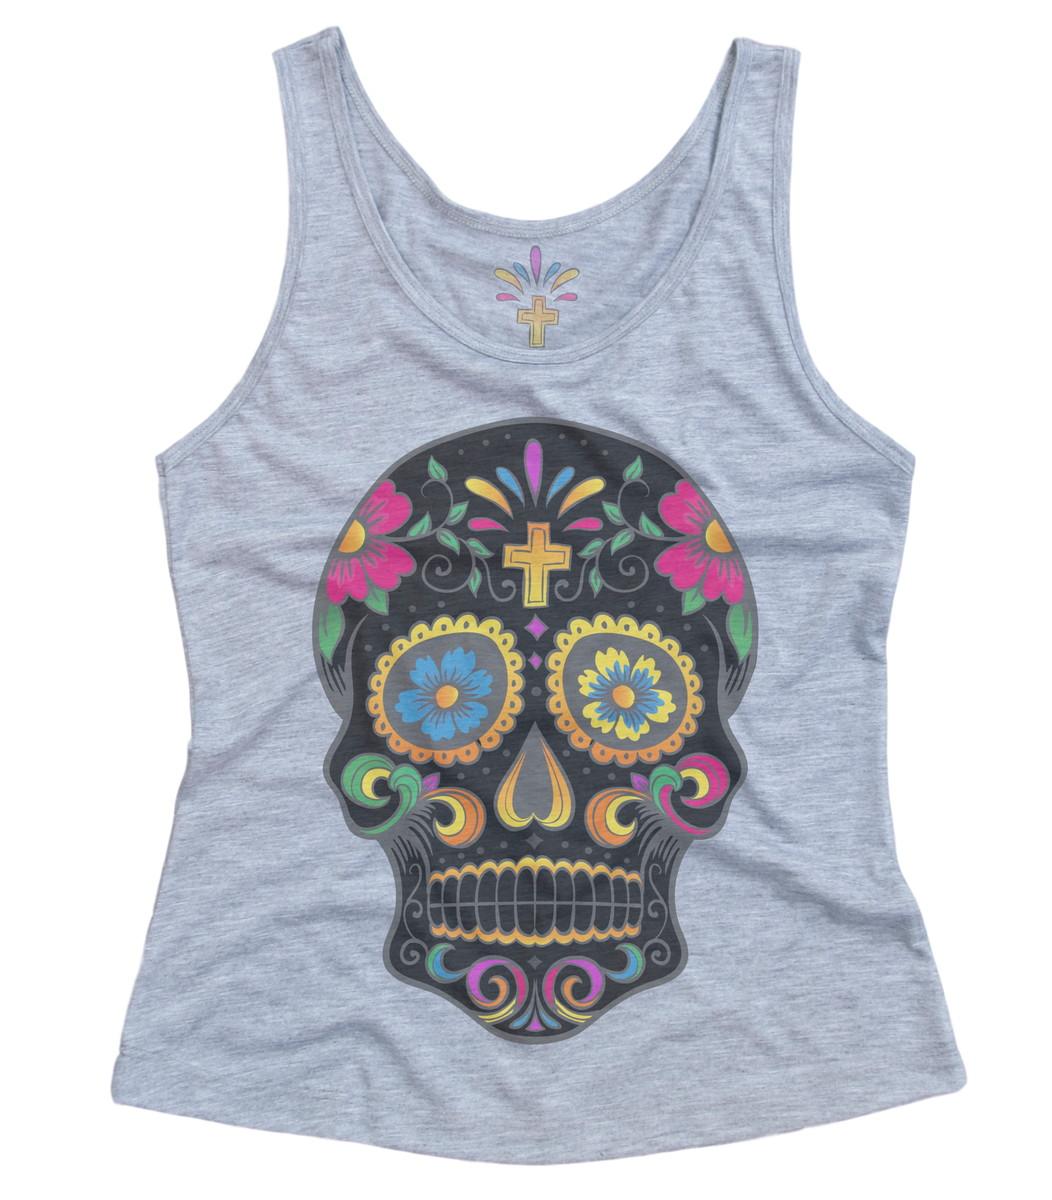 64b60fd80 Camiseta Regata Feminina Caveira Mexicana Skull Black no Elo7 ...